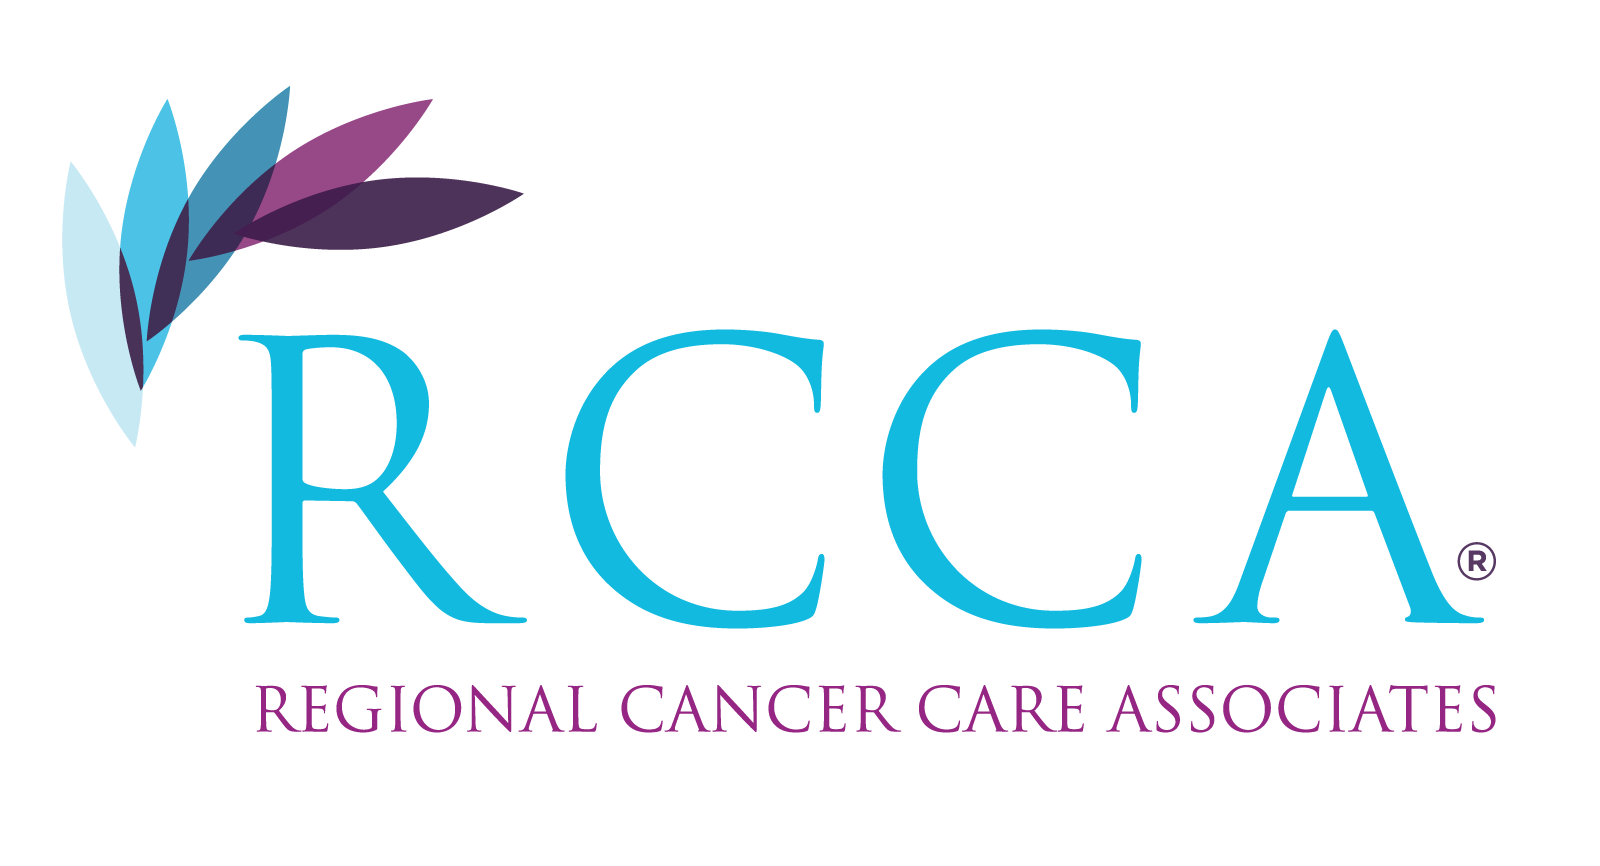 RCCA logo